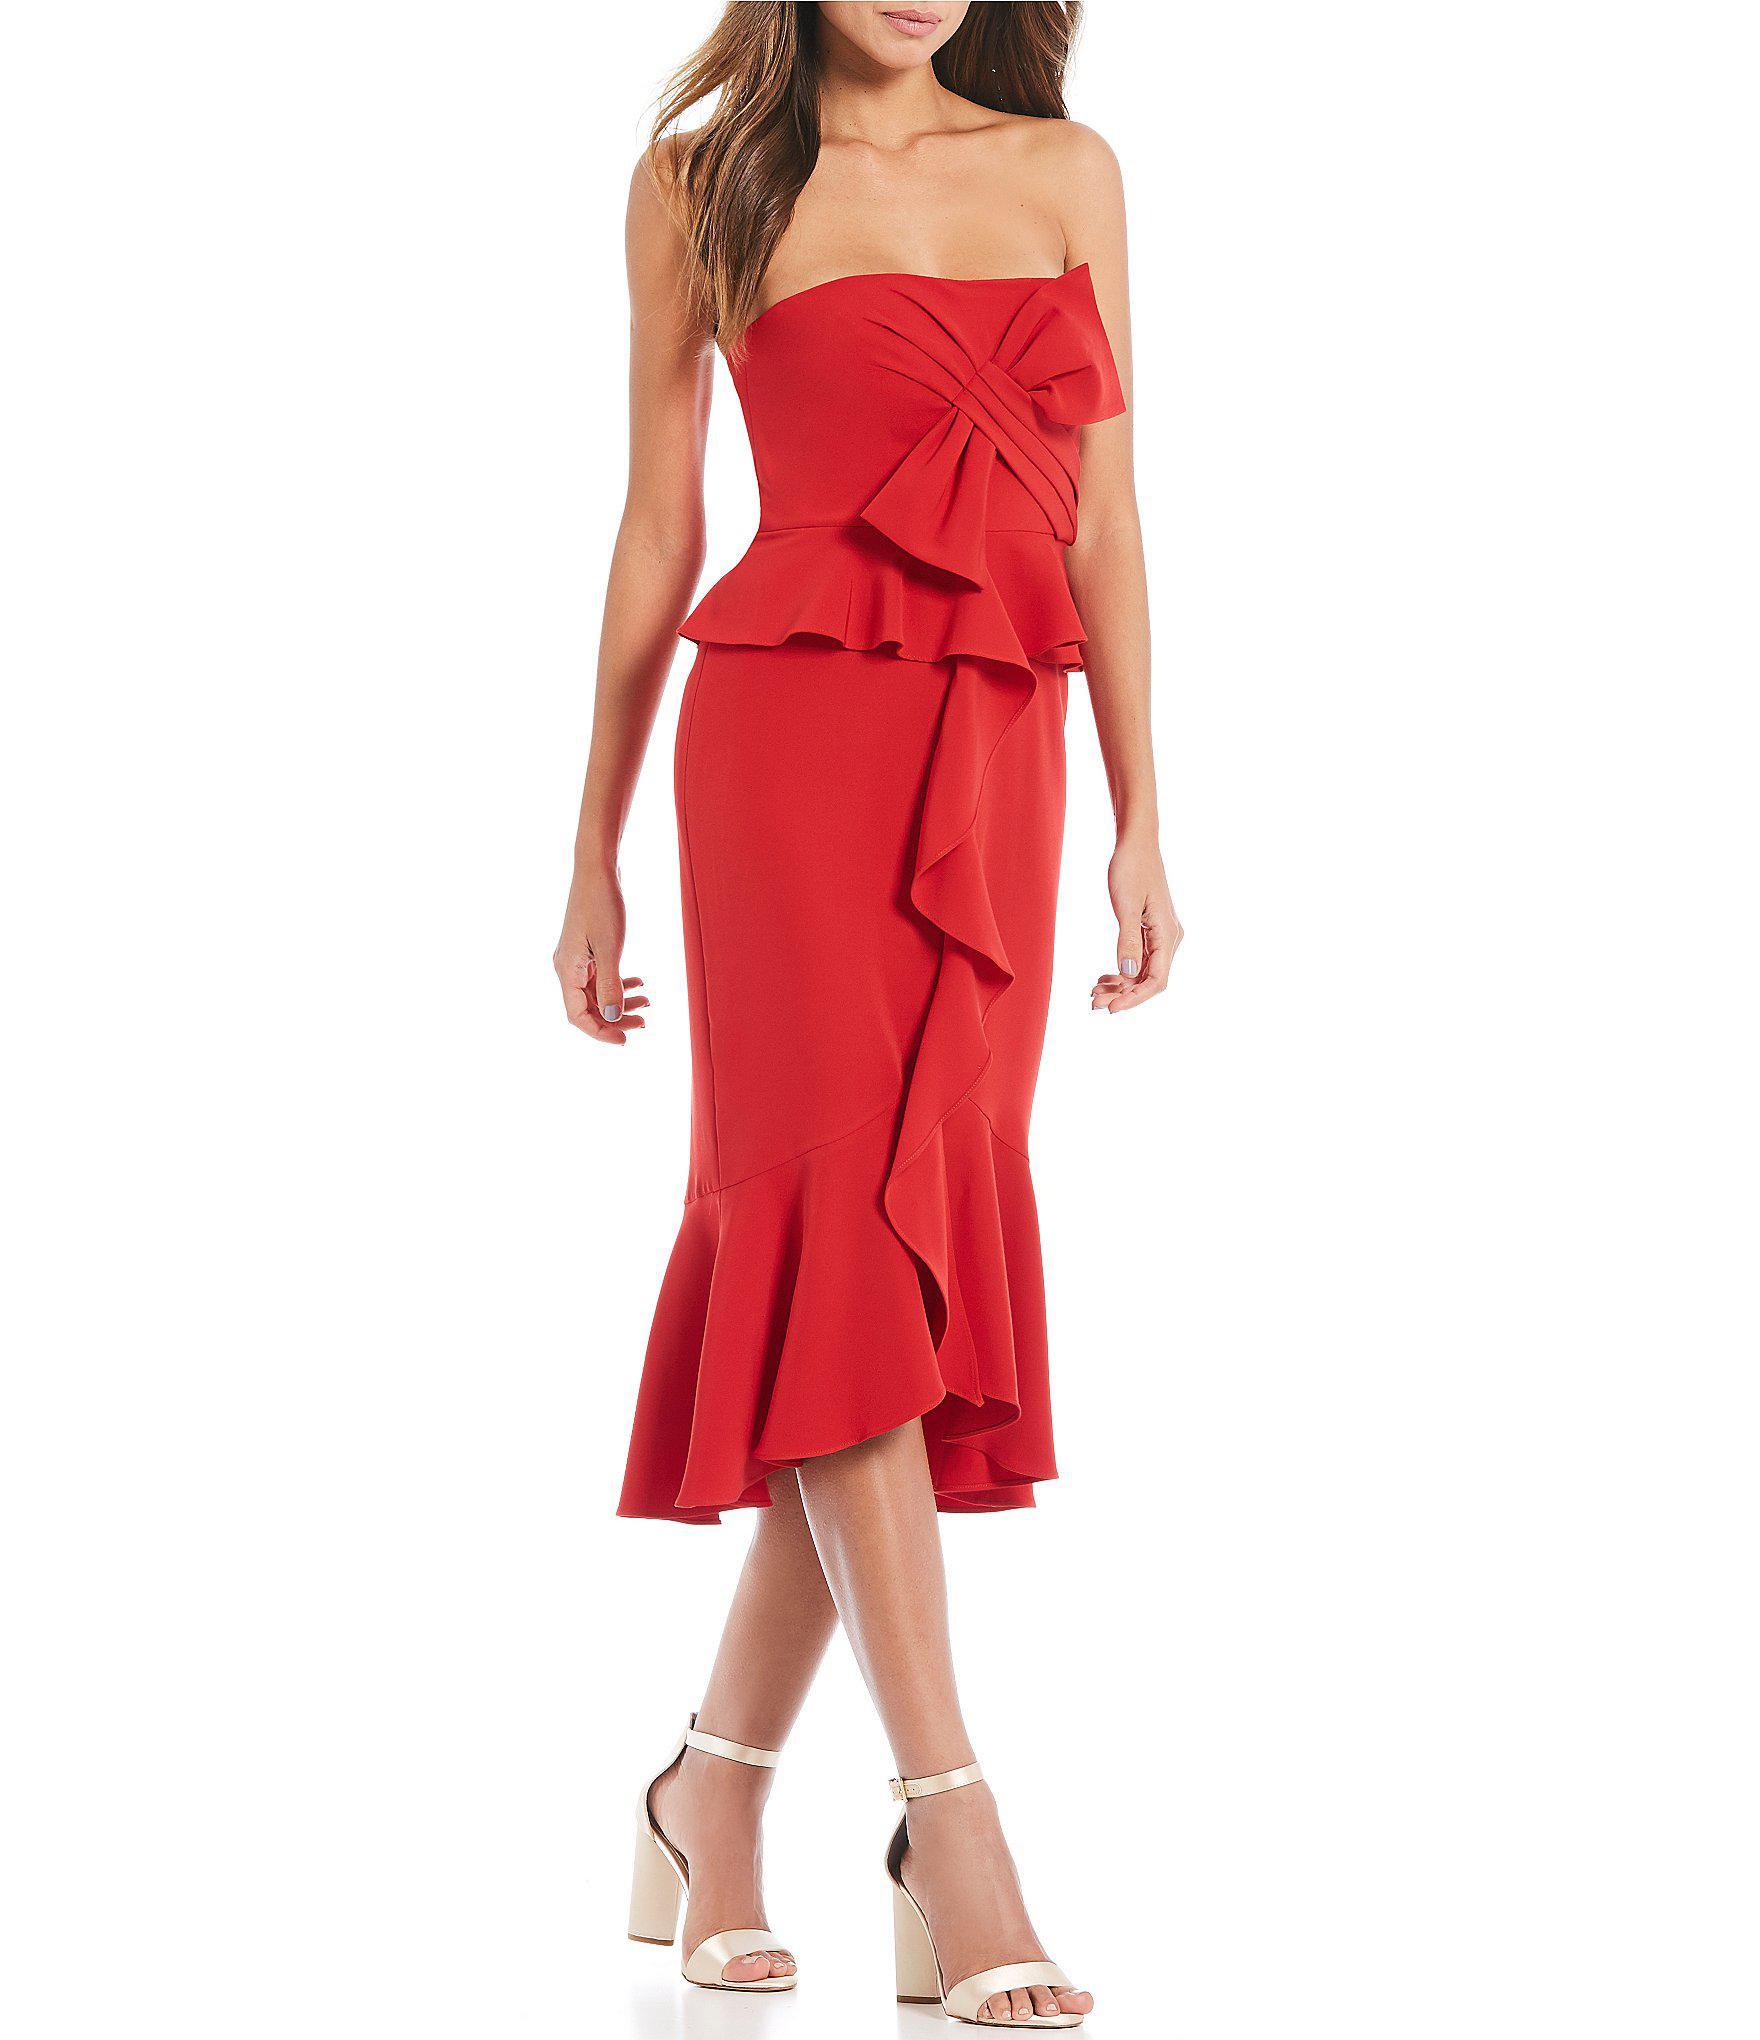 0cbb36bdb1 Gianni Bini Lana Bow Detail Strapless Midi Dress in Red - Lyst